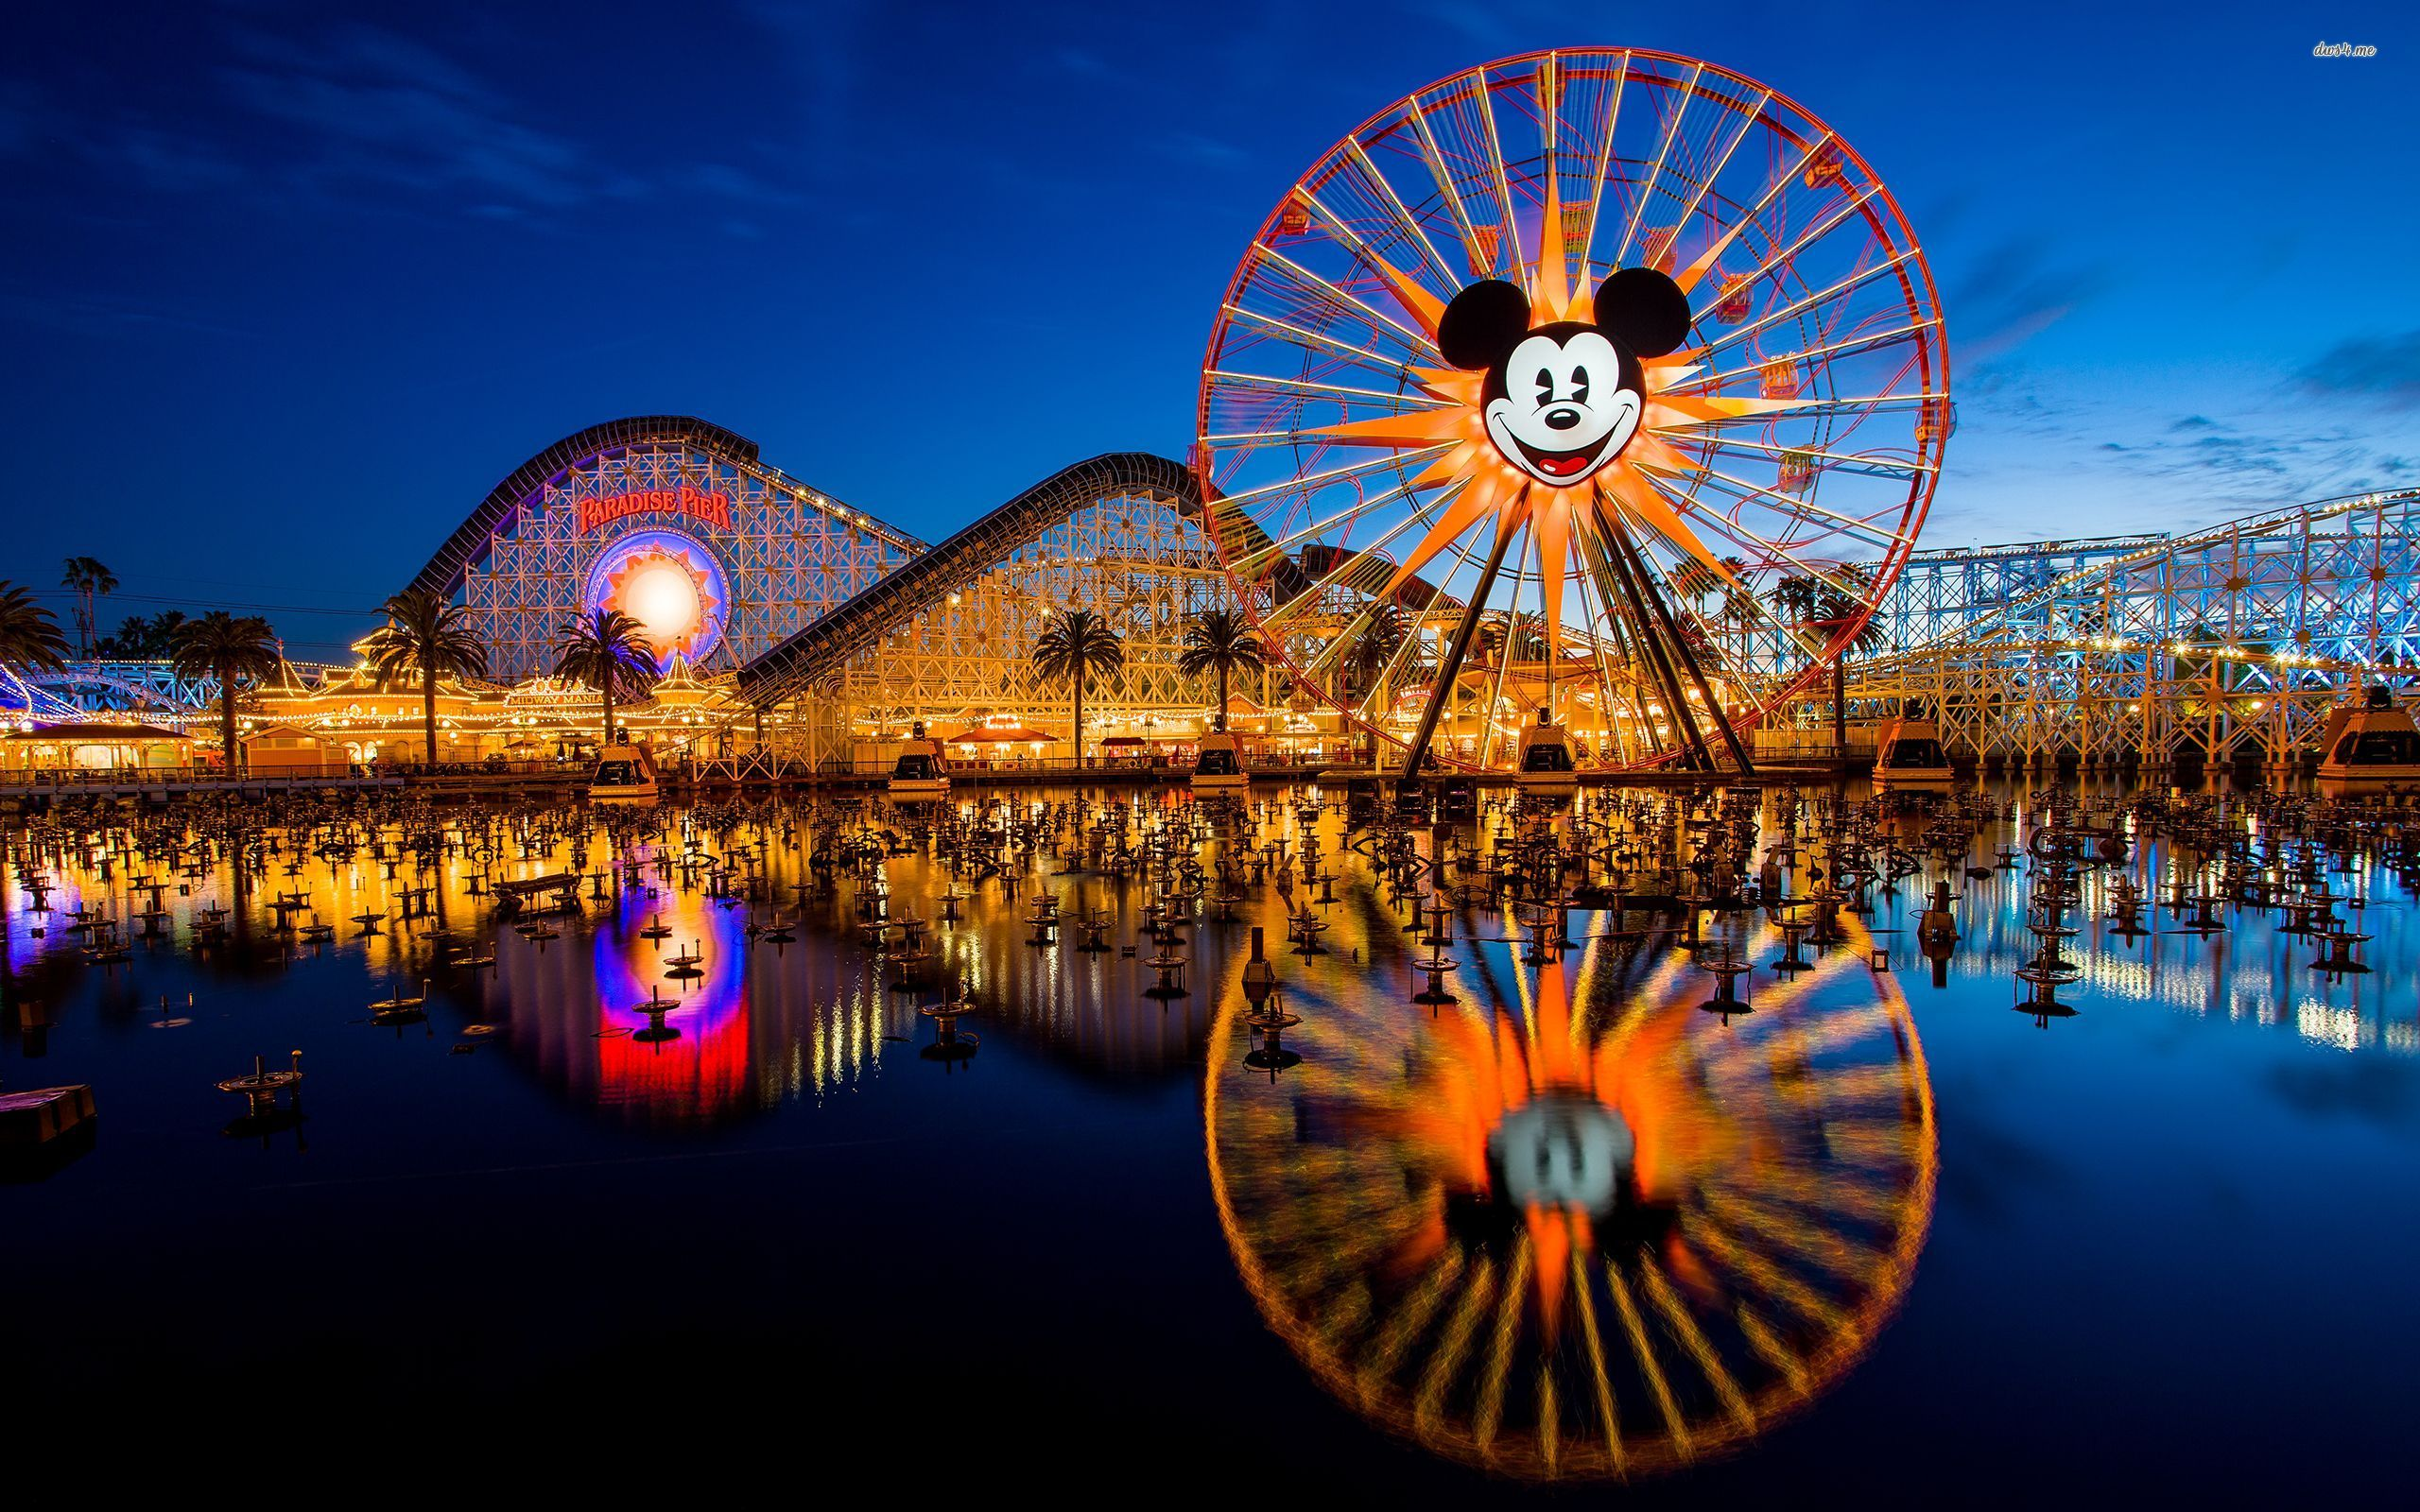 34 Disneyland Park Wallpapers On Wallpapersafari